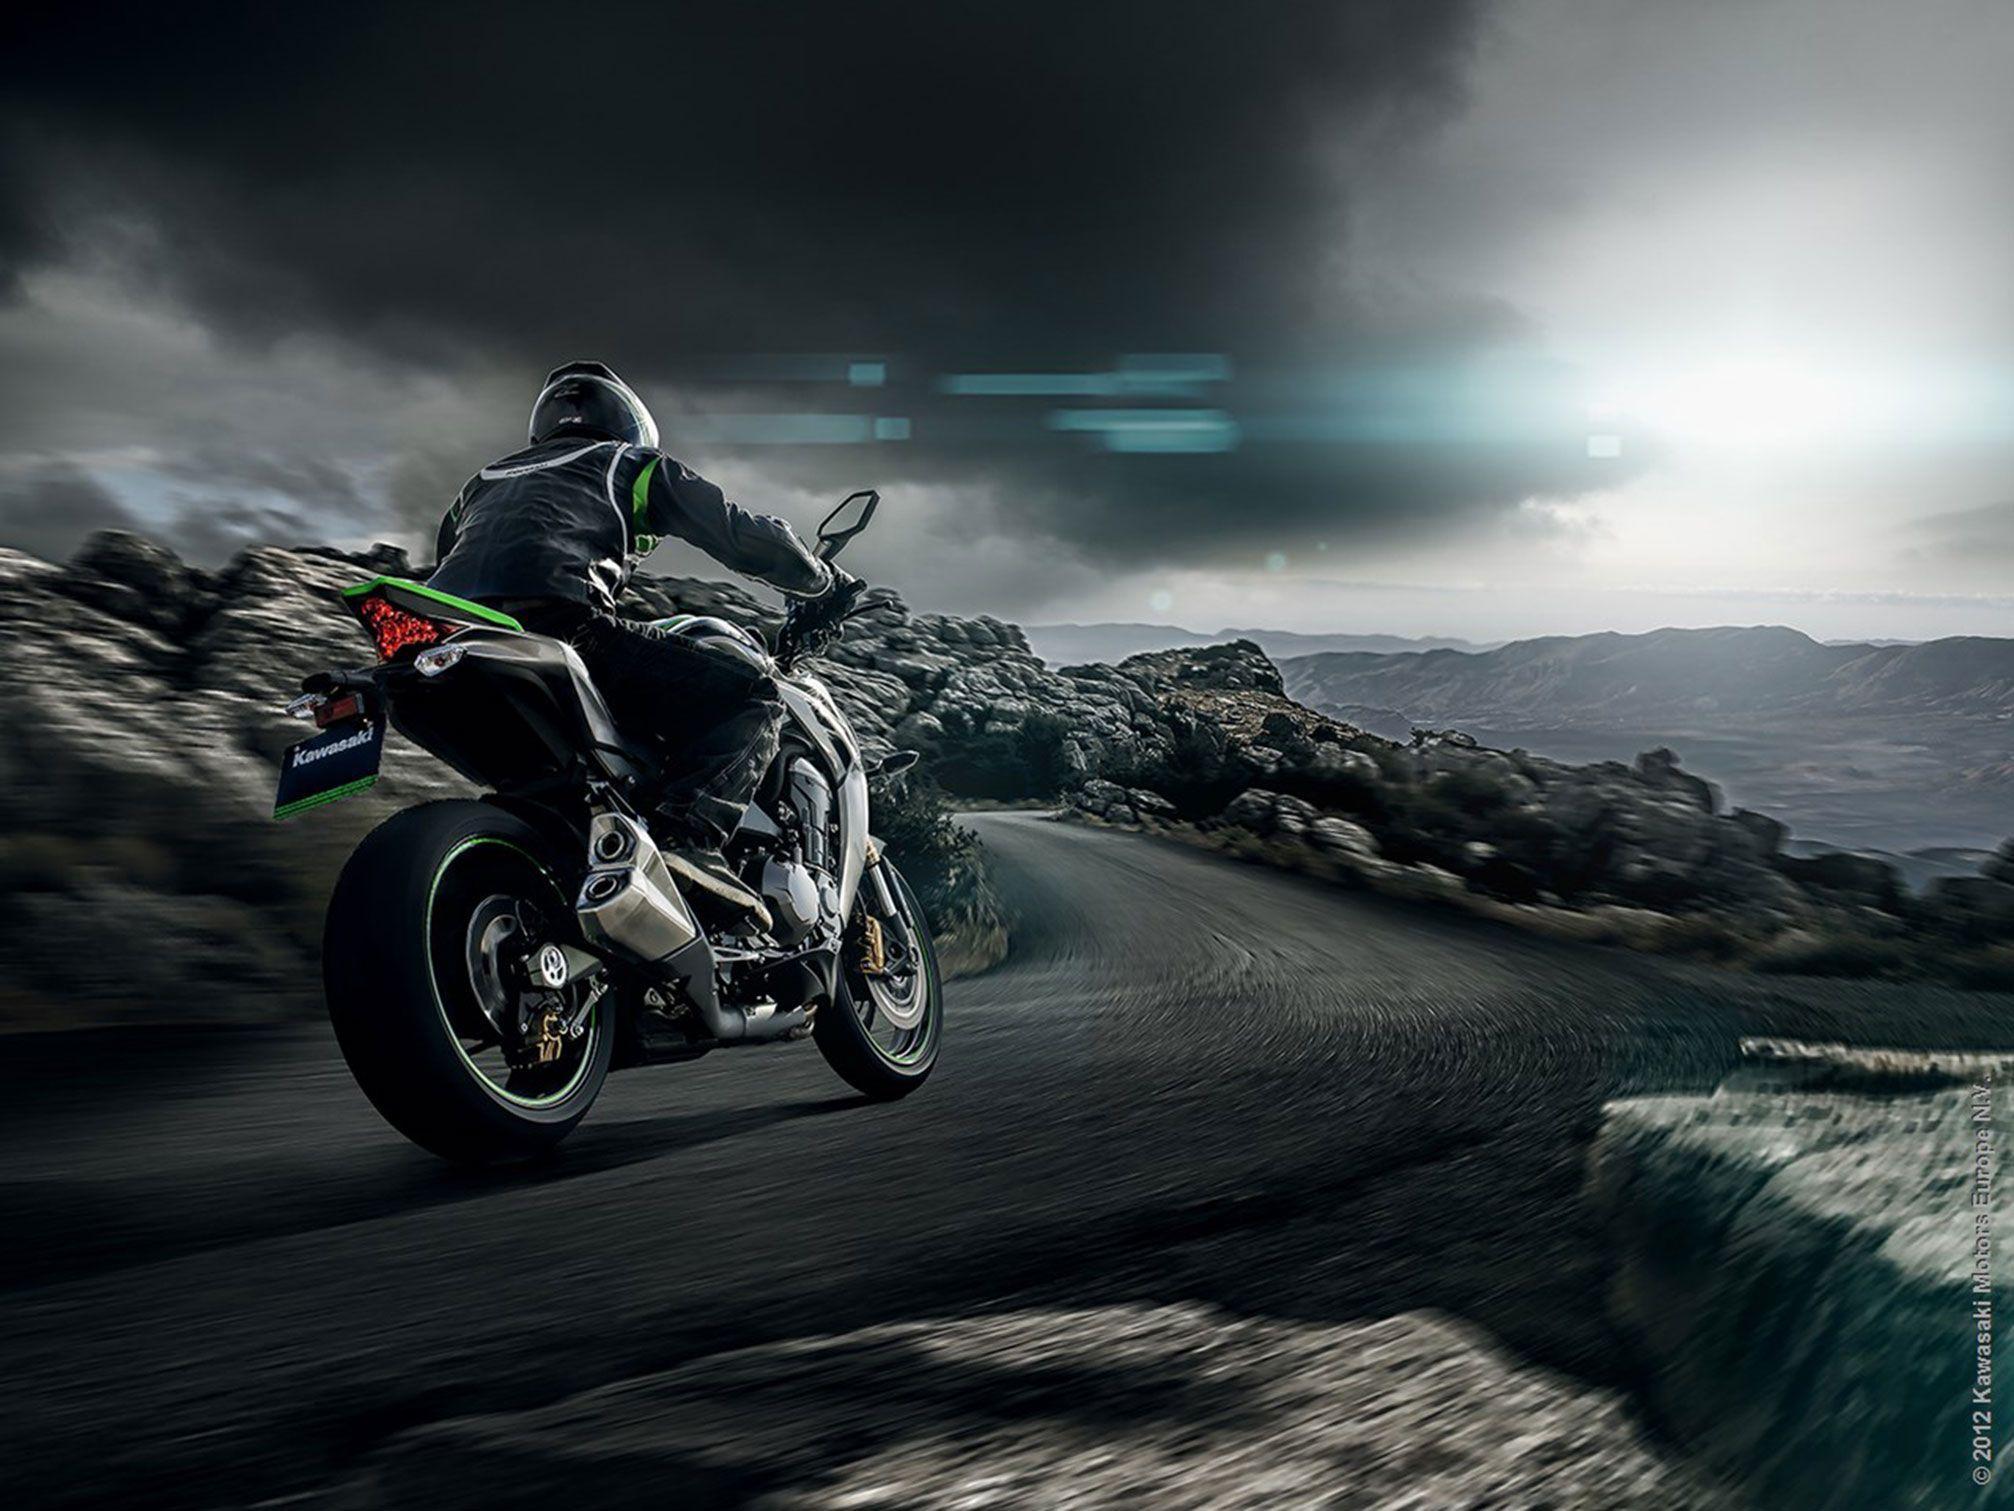 Motos Pisteras Ninja Hd 1280x1024: Kawasaki Wallpaper